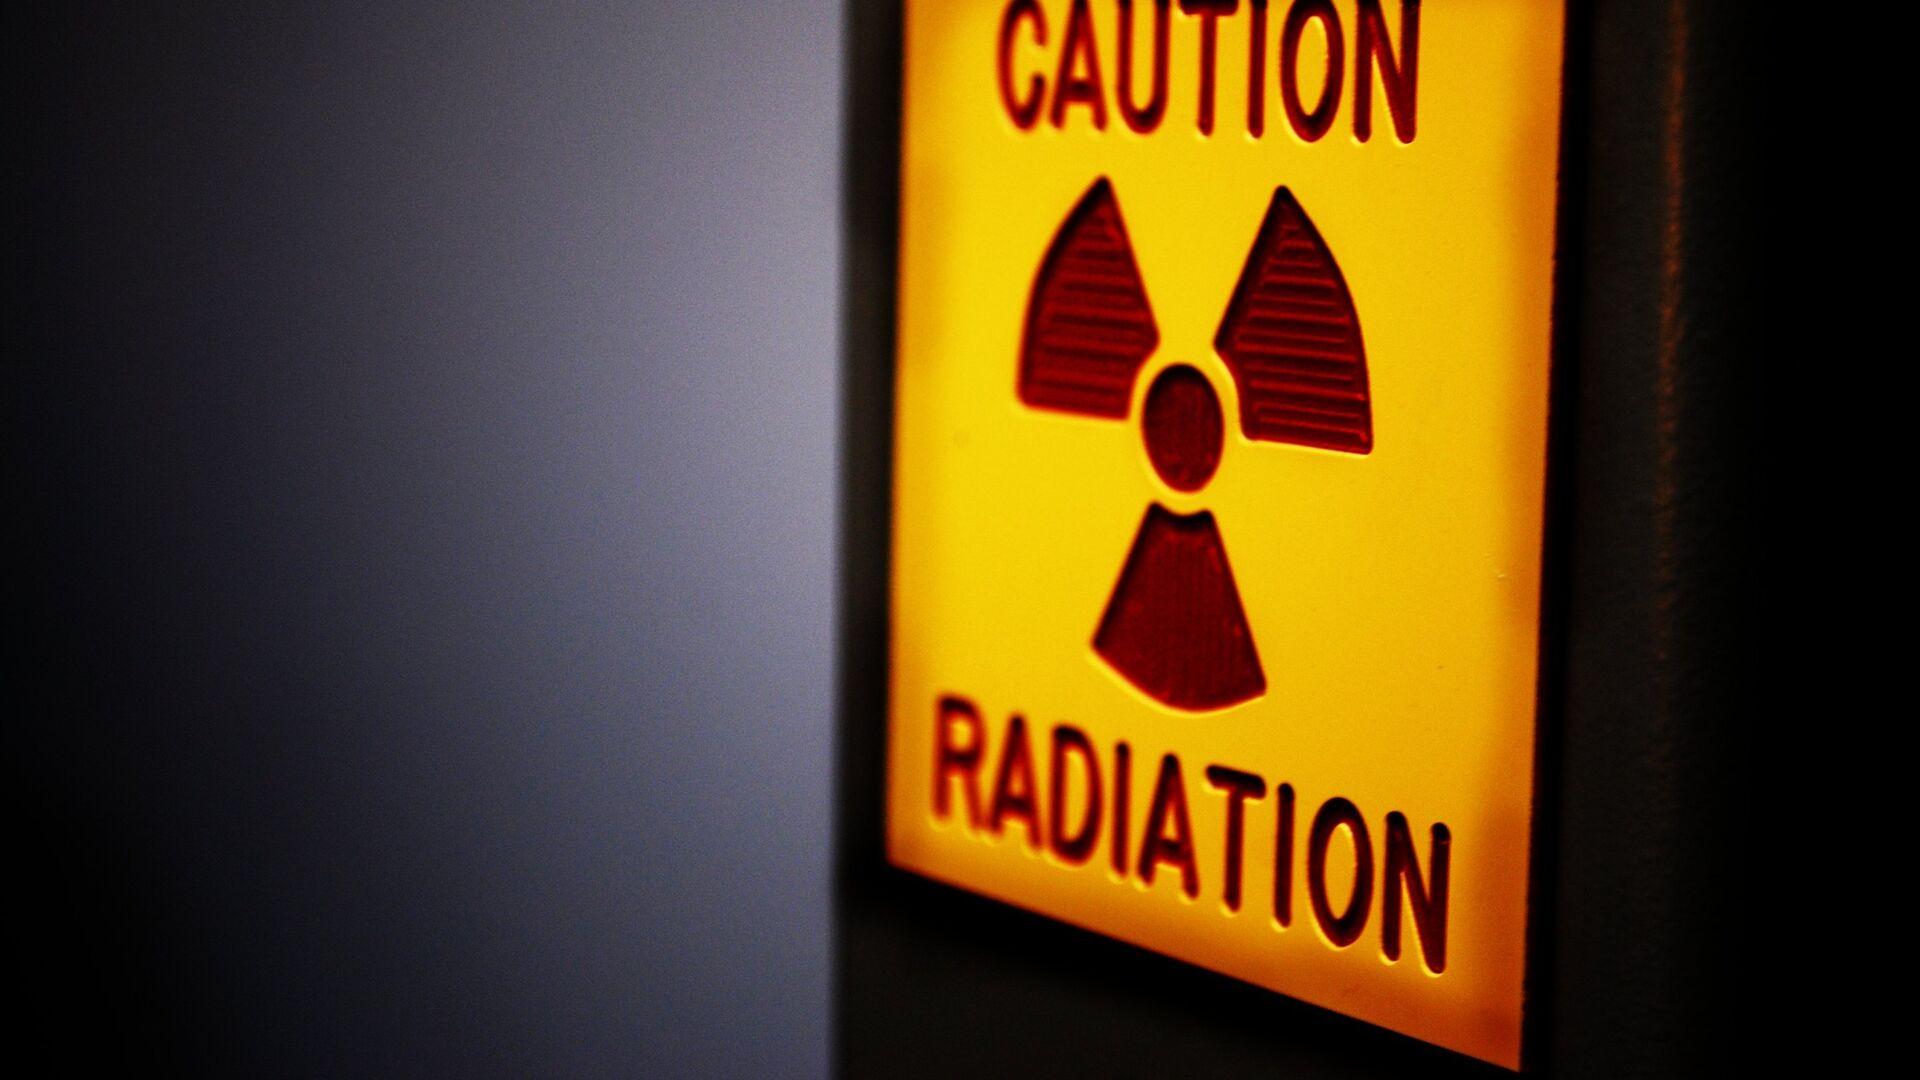 Radiation sign - Sputnik Mundo, 1920, 26.03.2021